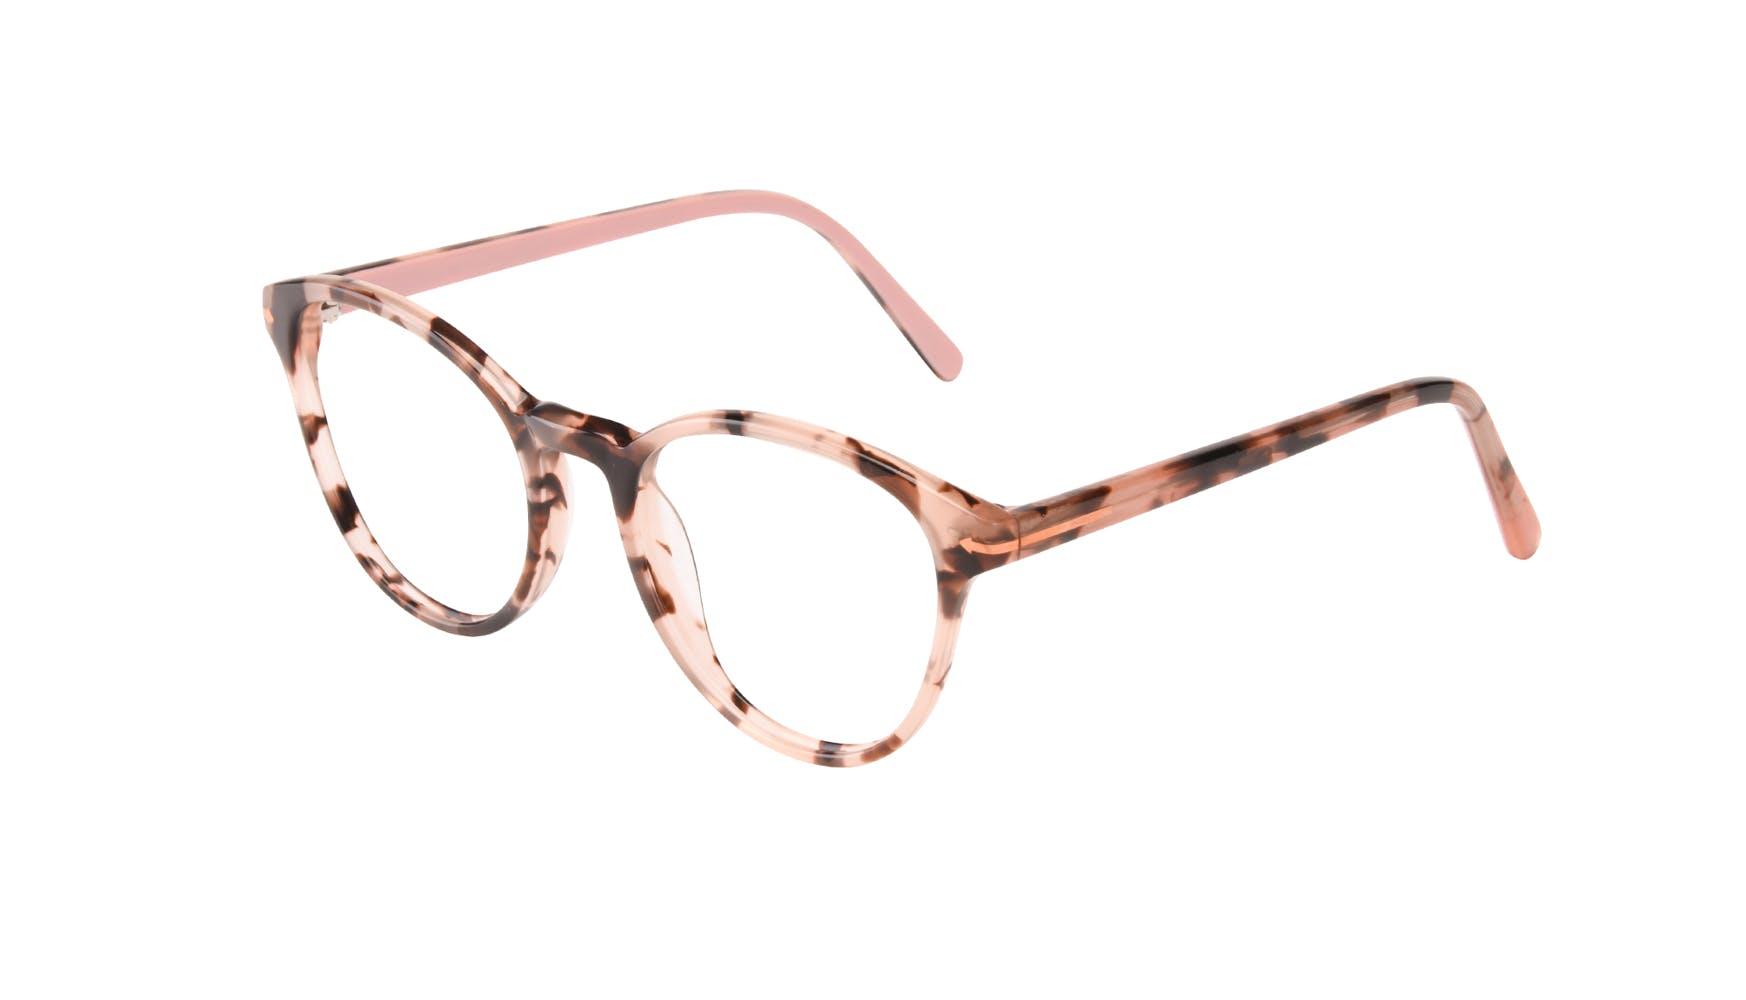 Affordable Fashion Glasses Round Eyeglasses Women London Wisteria Tilt